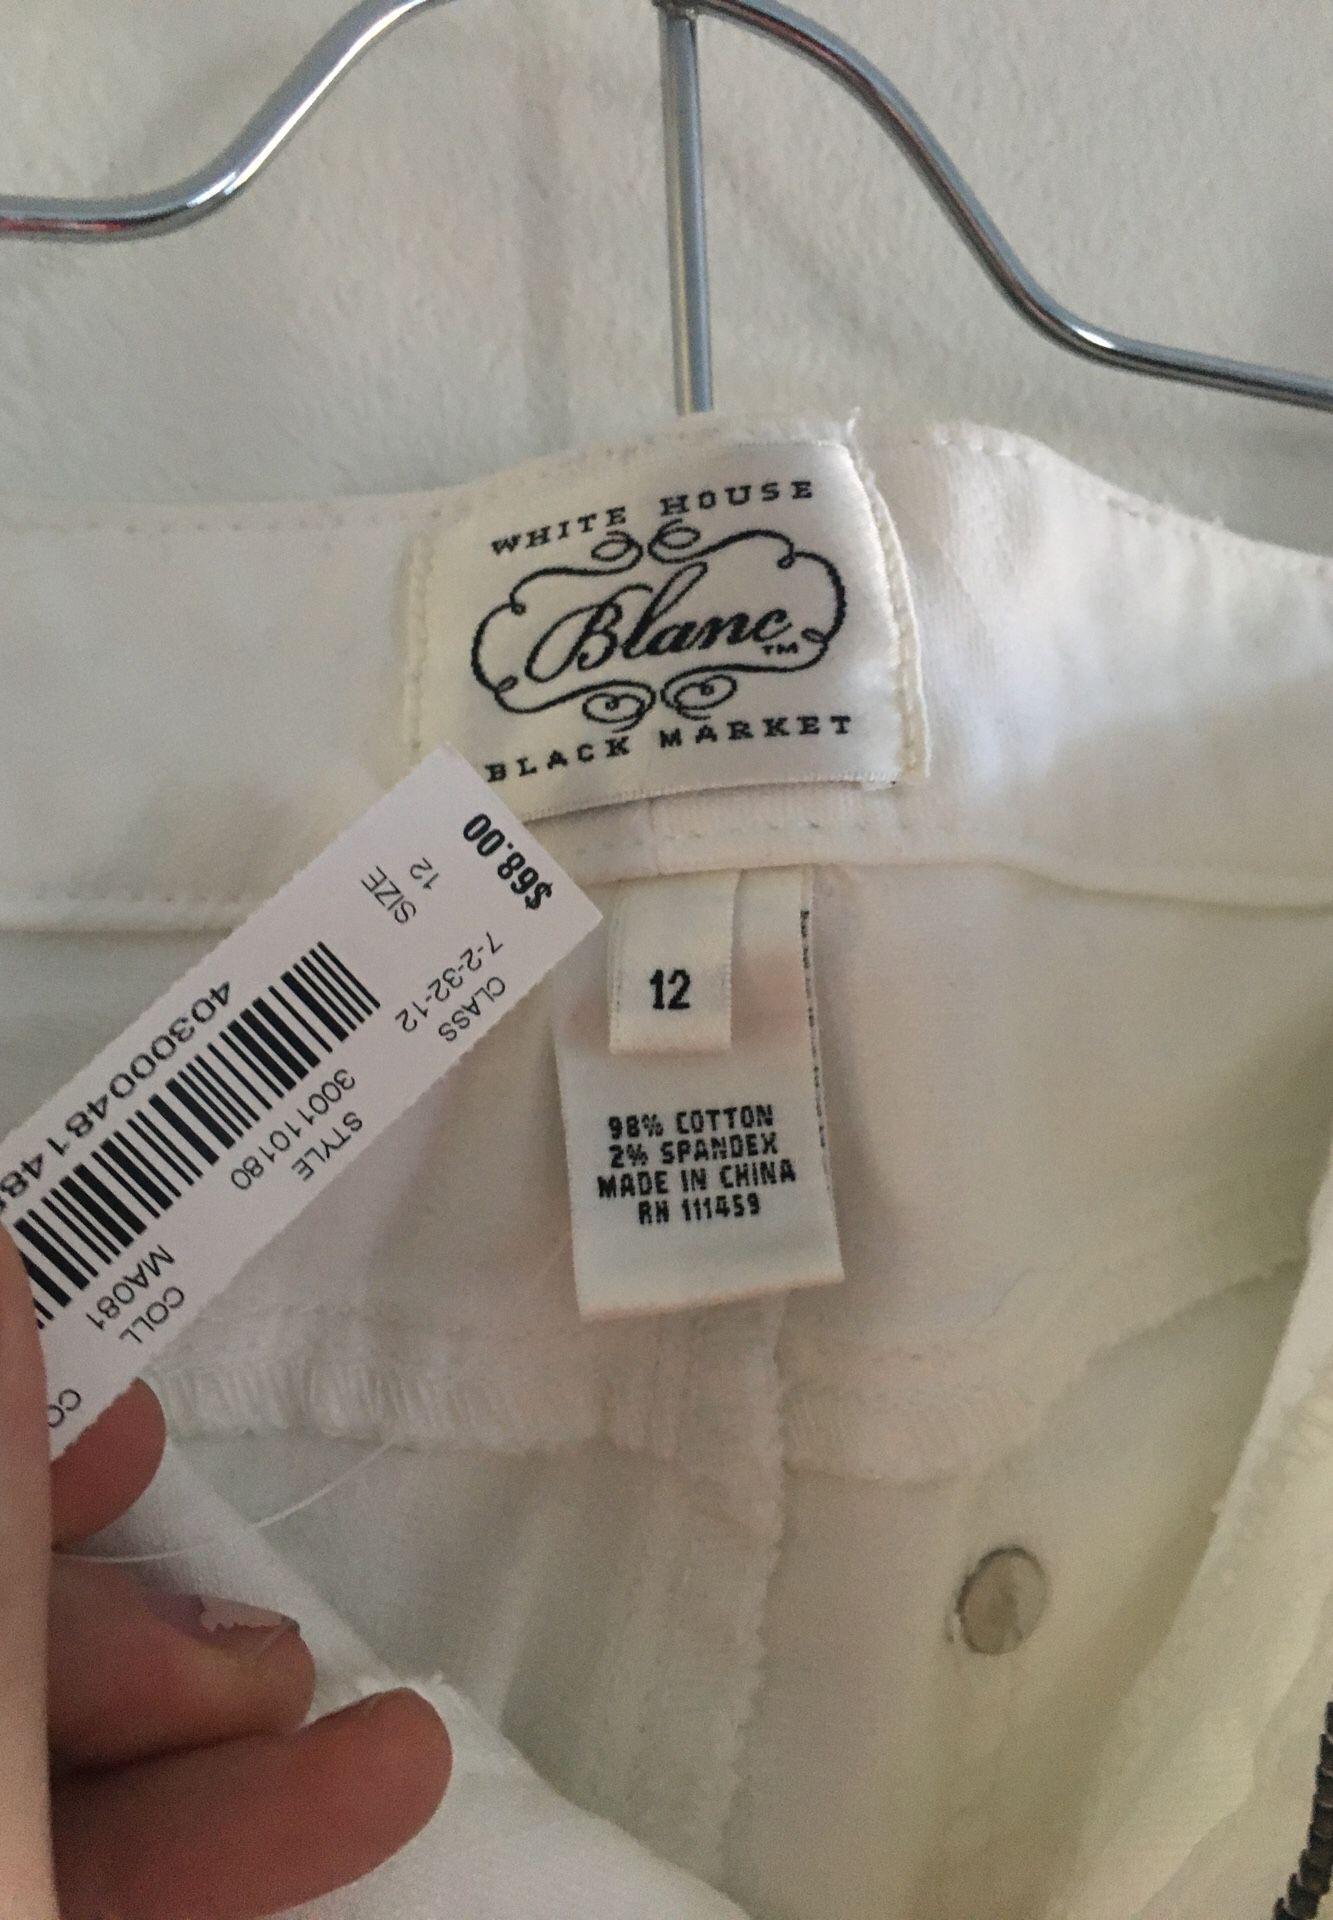 Size 12. White House black market. Blanc fit.